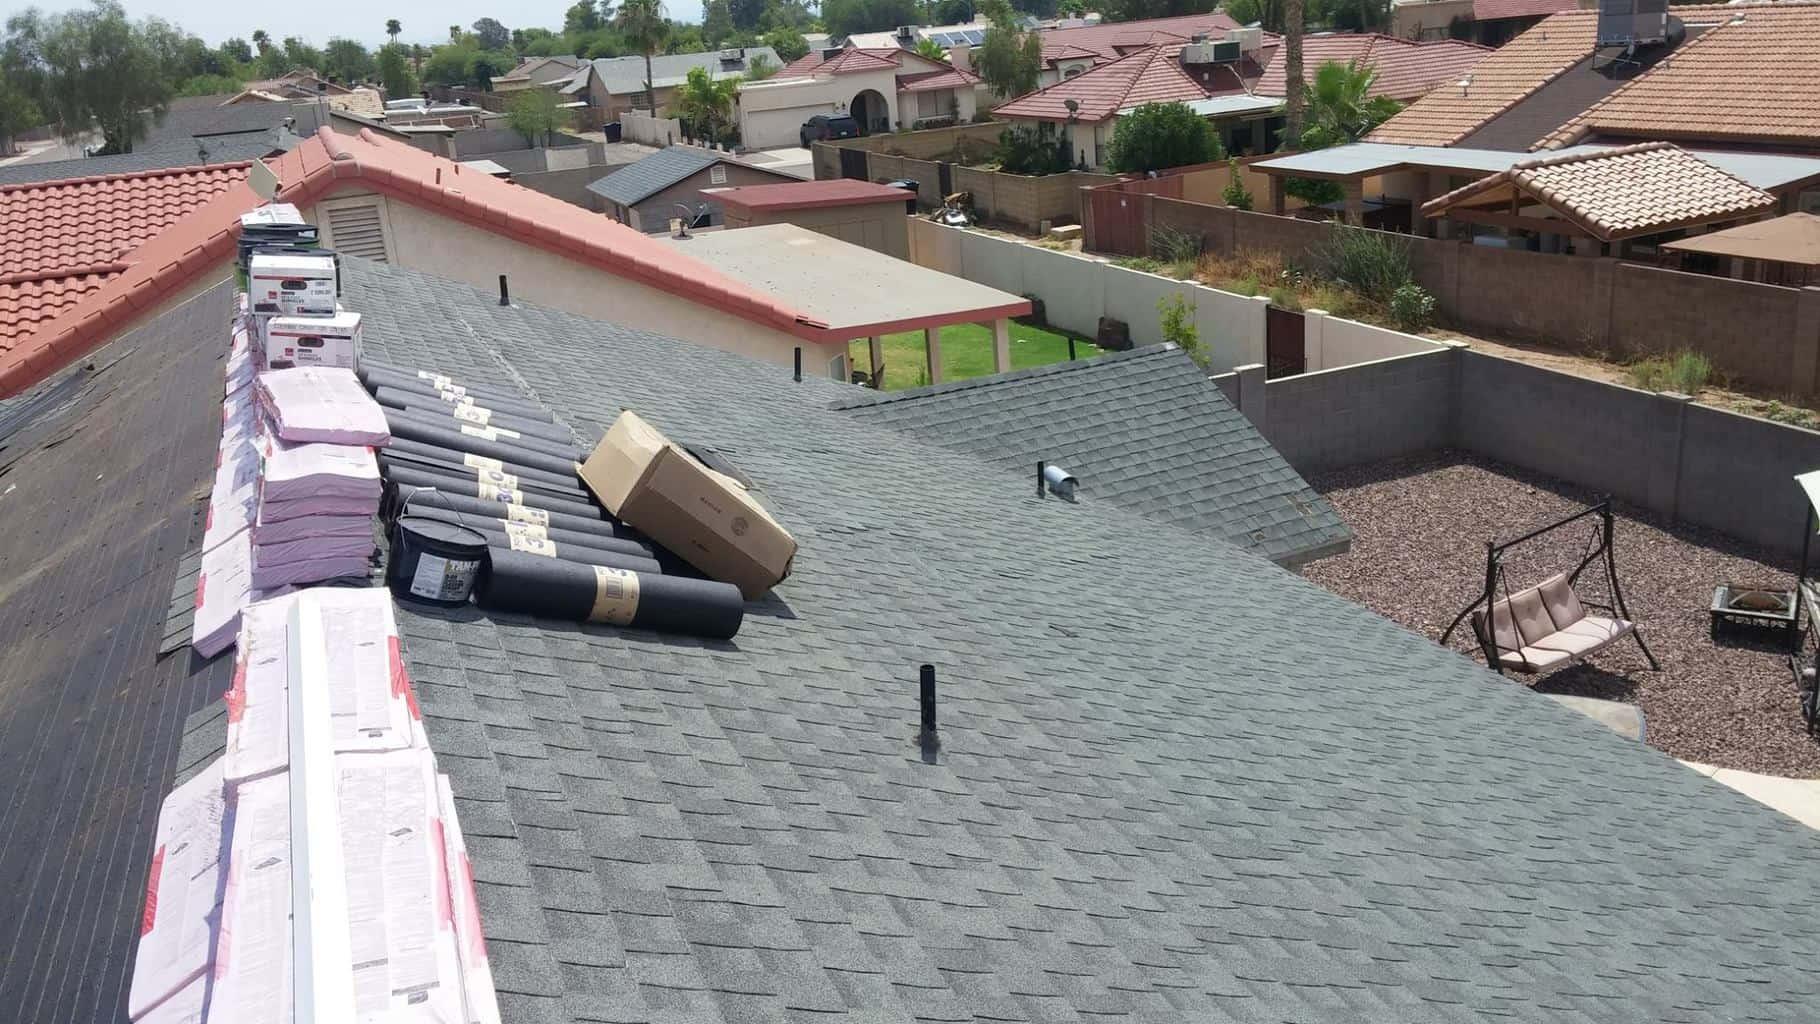 castile roofing in phoenix az your